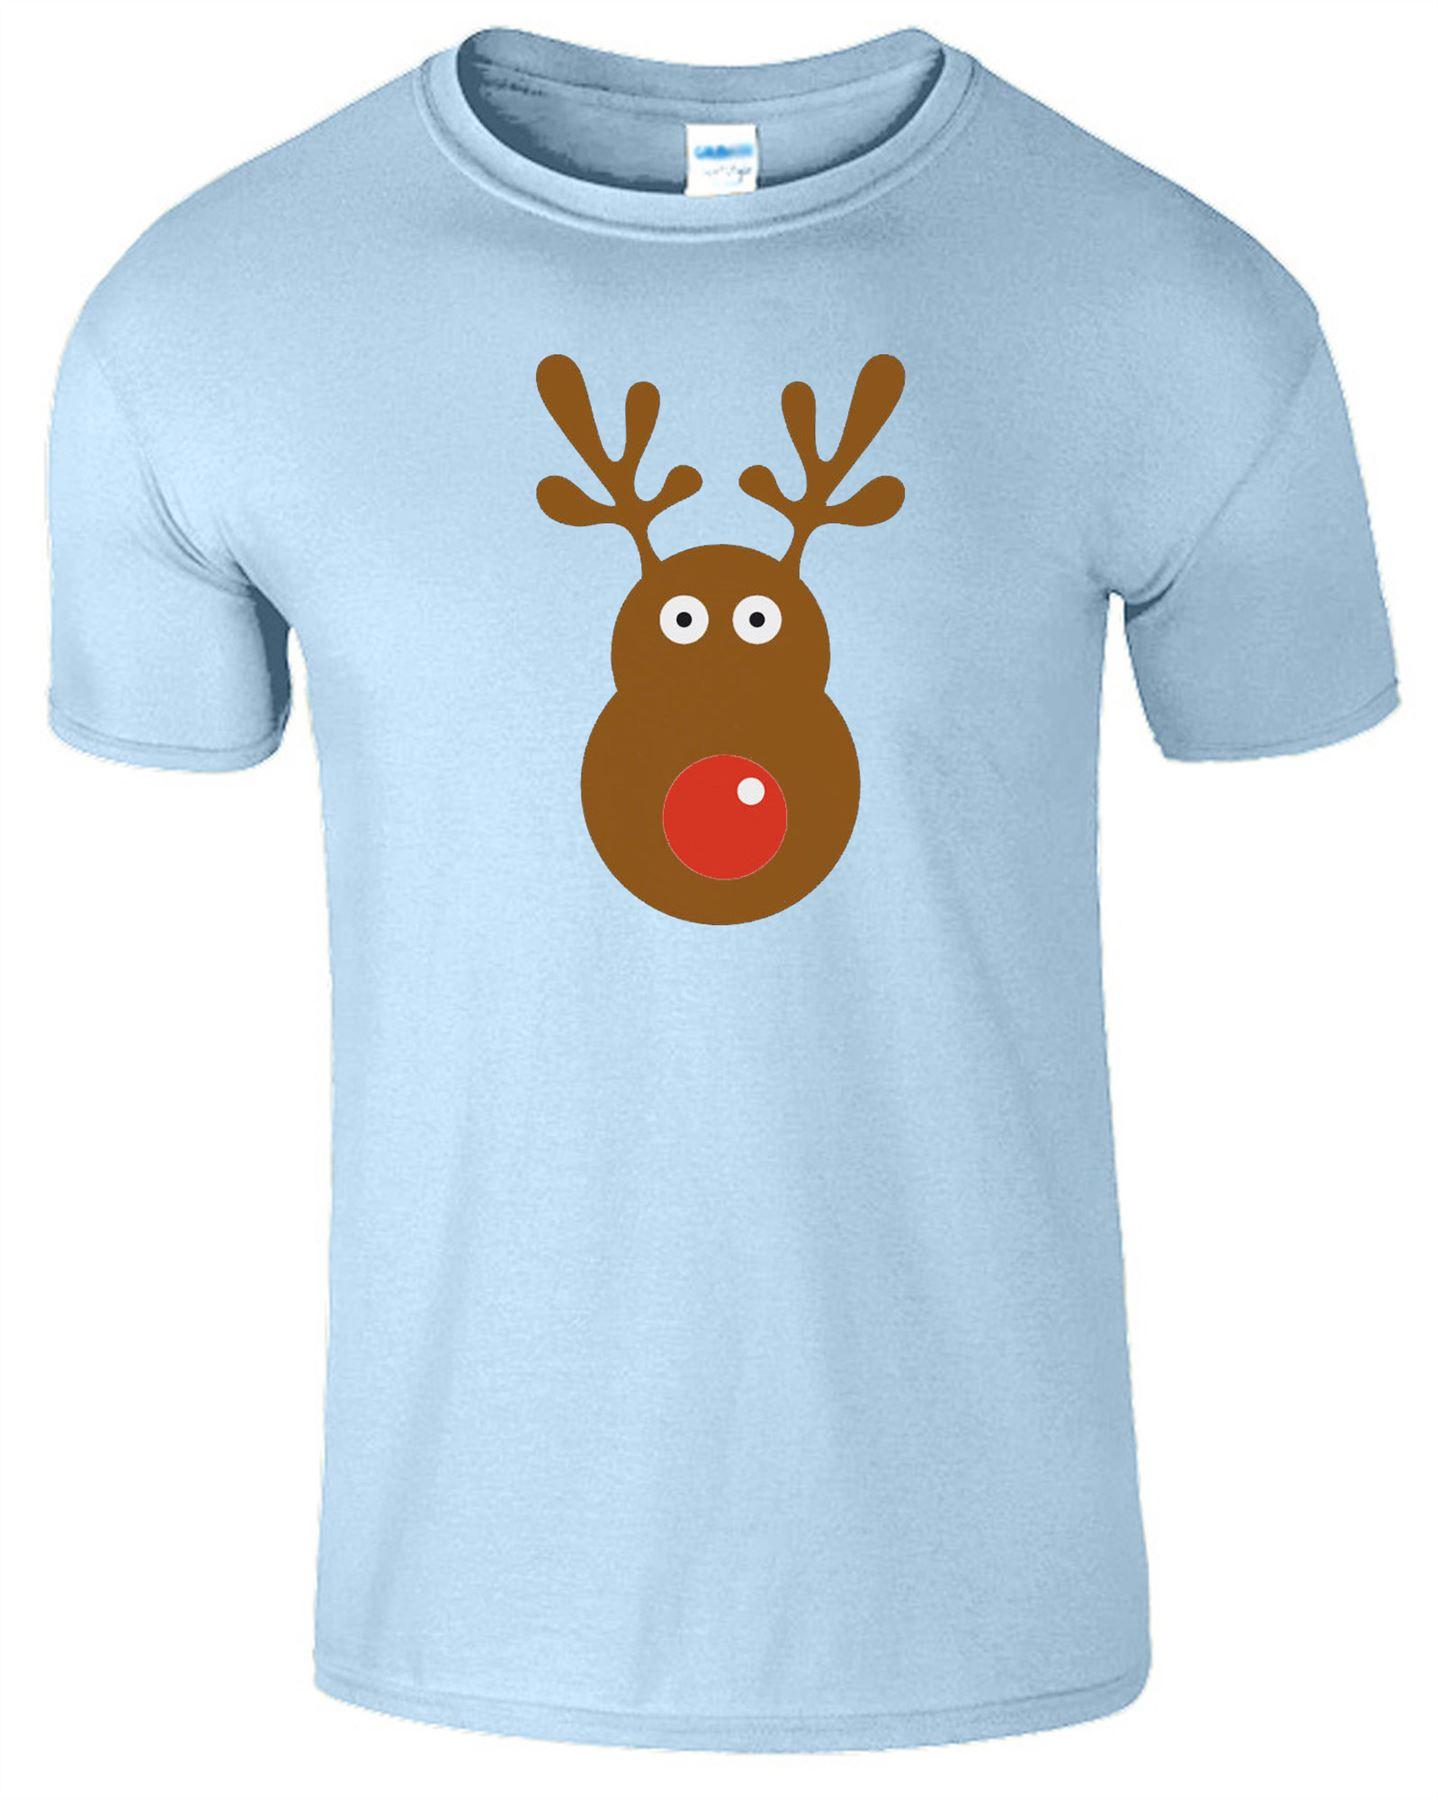 Rudolph Reindeer Face Christmas Kids Funny T-Shirt Xmas Gift Top ...